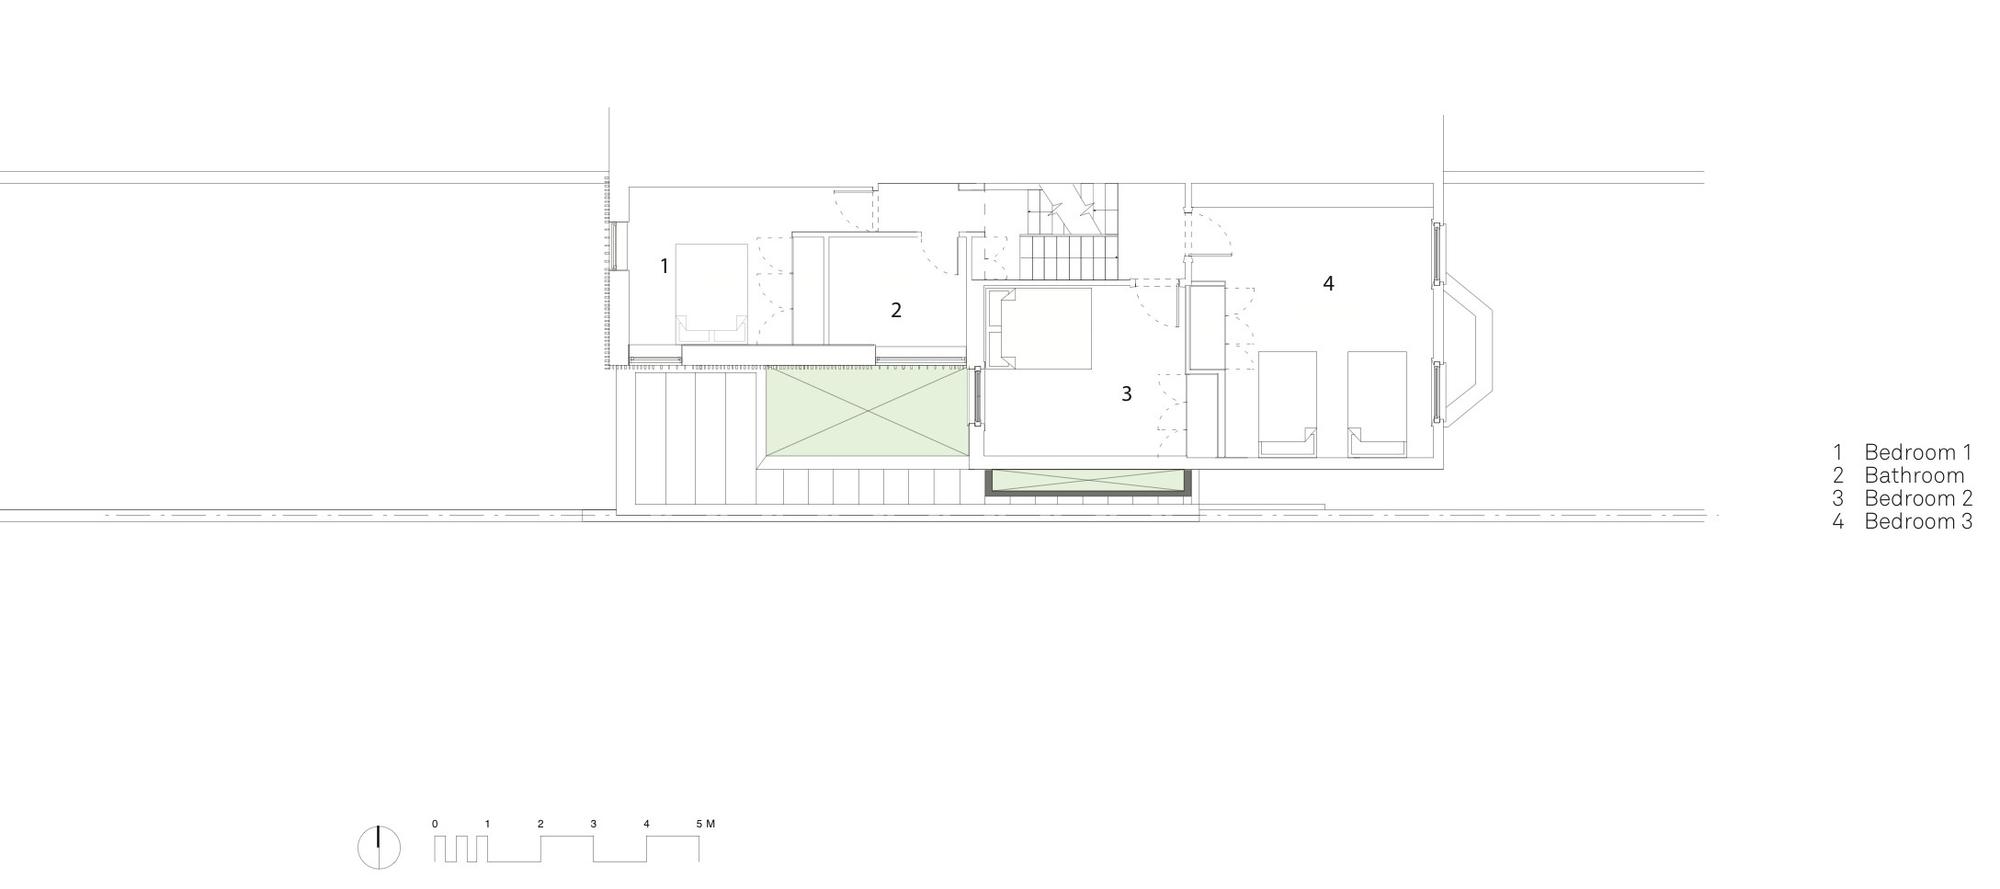 51d25bdab3fc4b583400009b_power-house-paul-archer-design_first_floor_plan